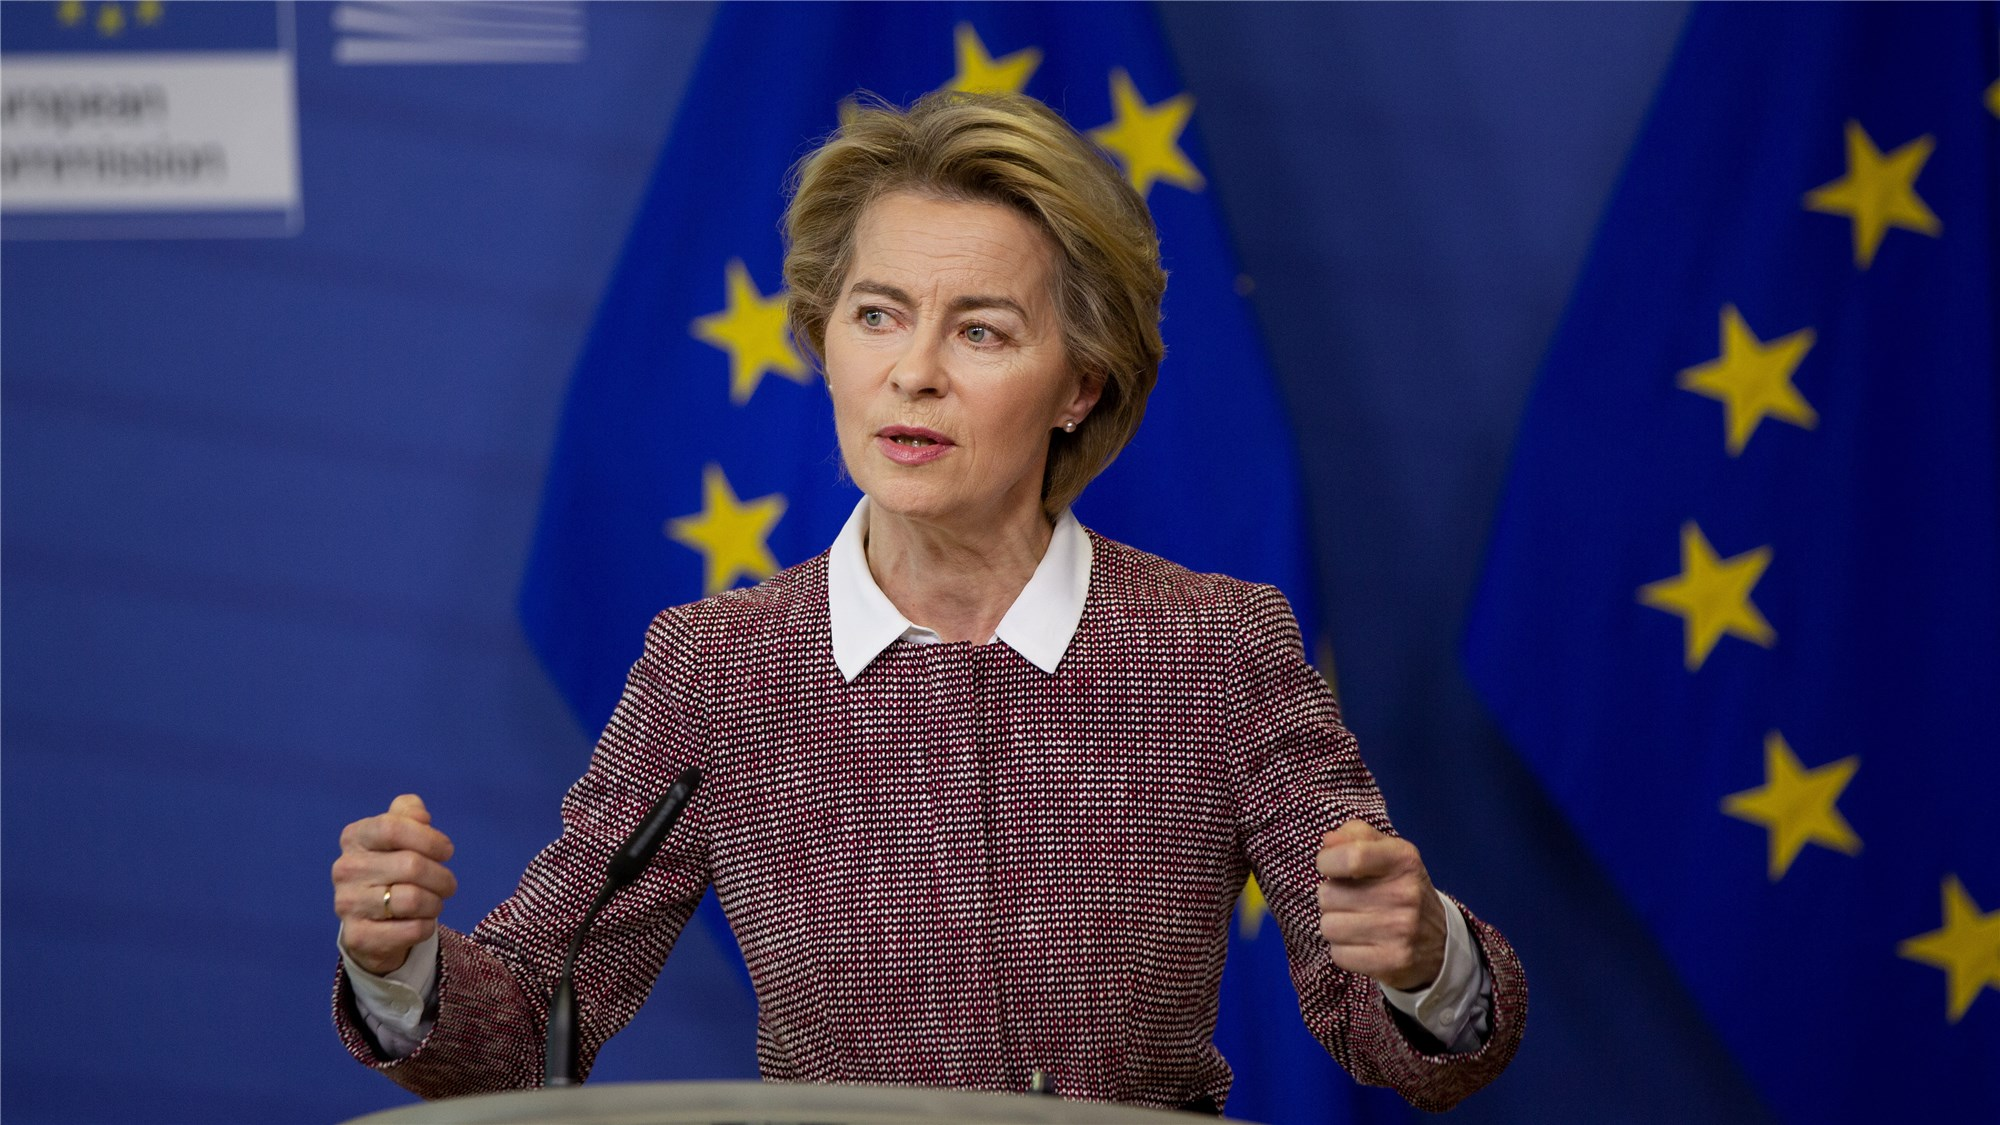 EU digital chiefs unveil long-awaited rules for 'ethical' AI technologies